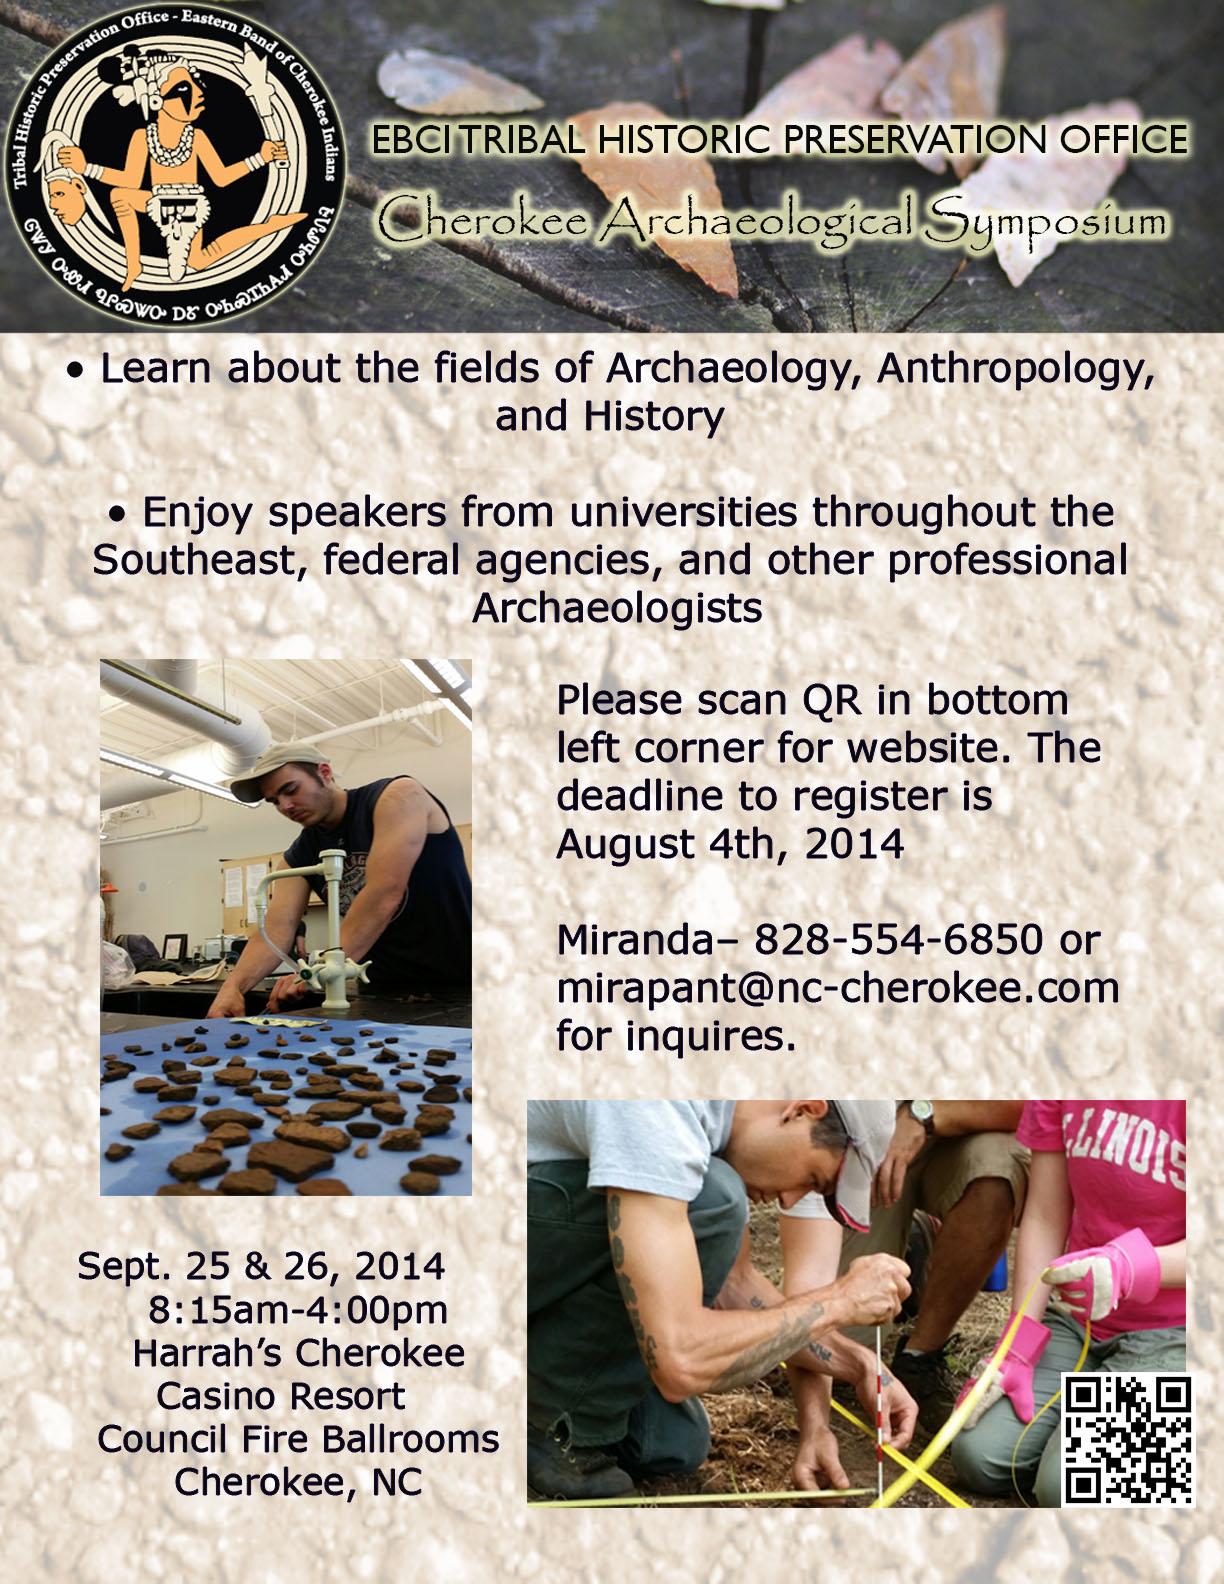 ArchaeologySymposium flyer 2014 2